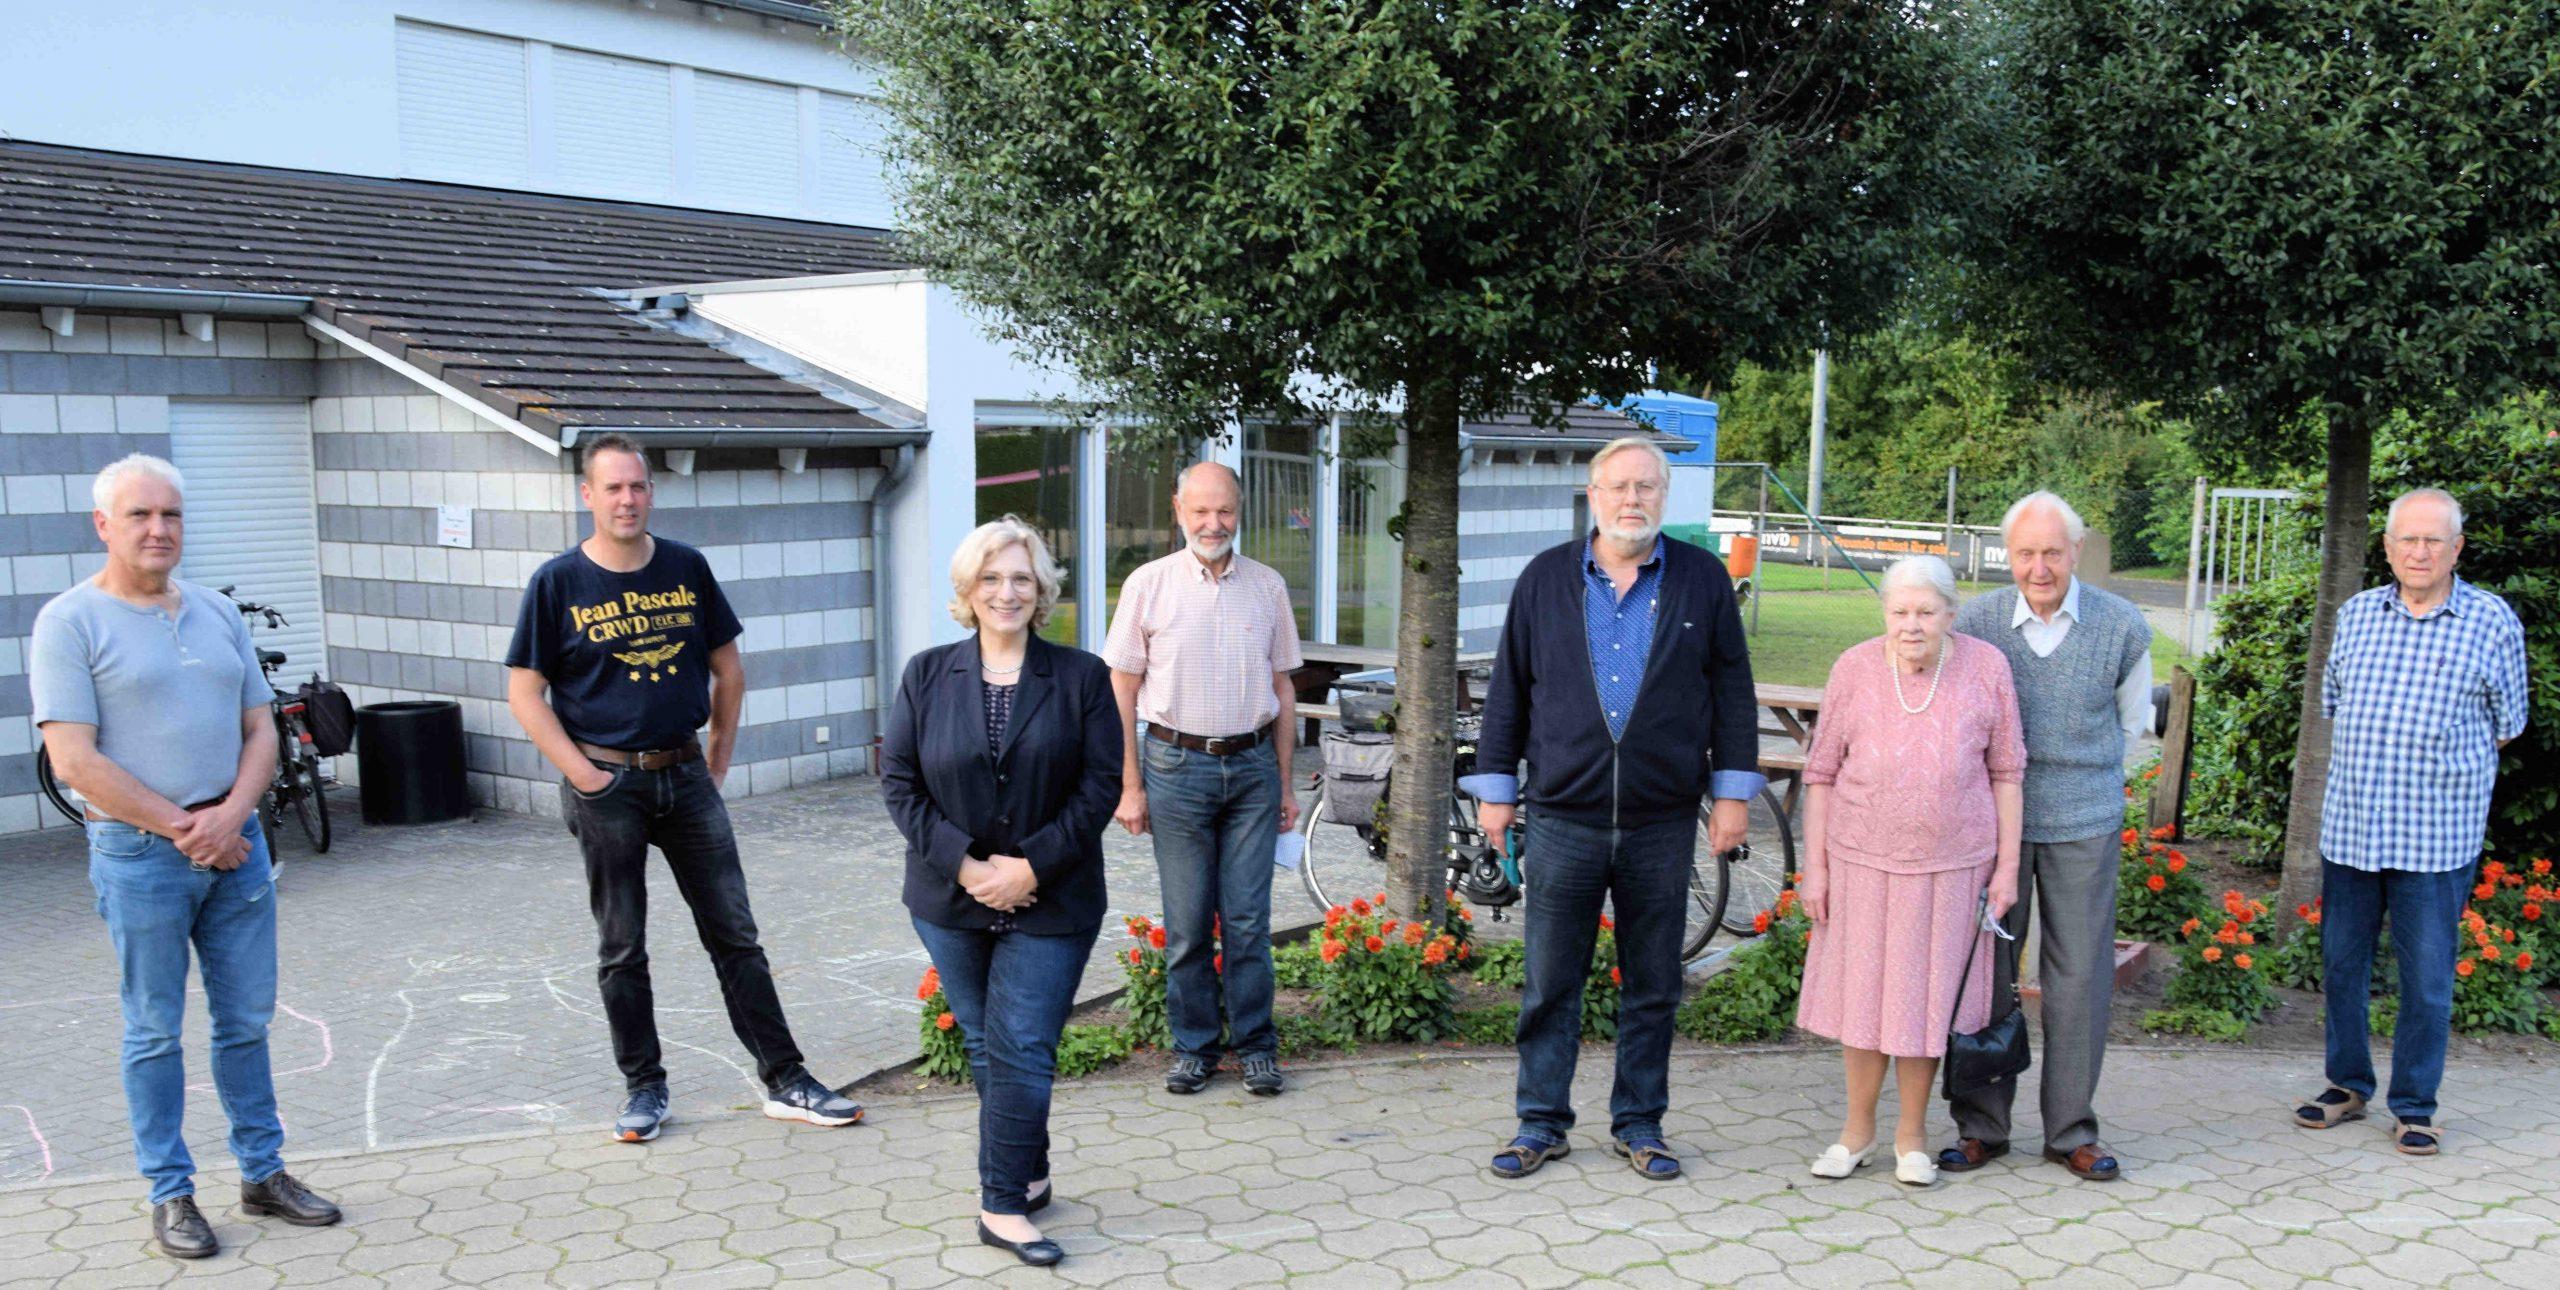 Dr. Daniela De Ridder zu Gast bei der Notgemeinschaft Nordhorn Range